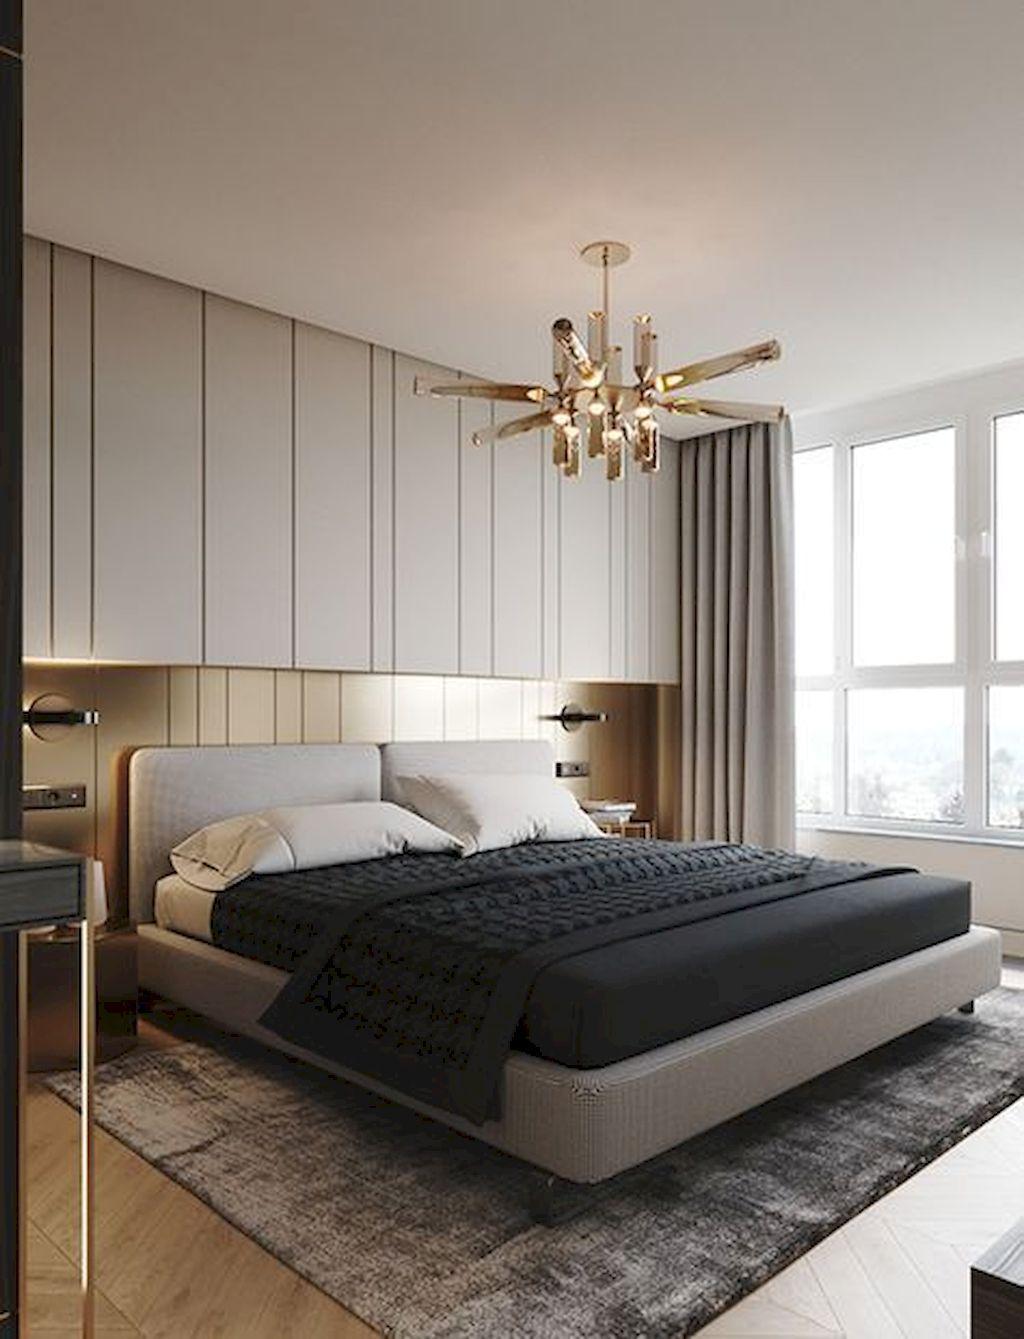 Minimalist Hotel Room: 80 Cozy Minimalist Bedroom Design Trends